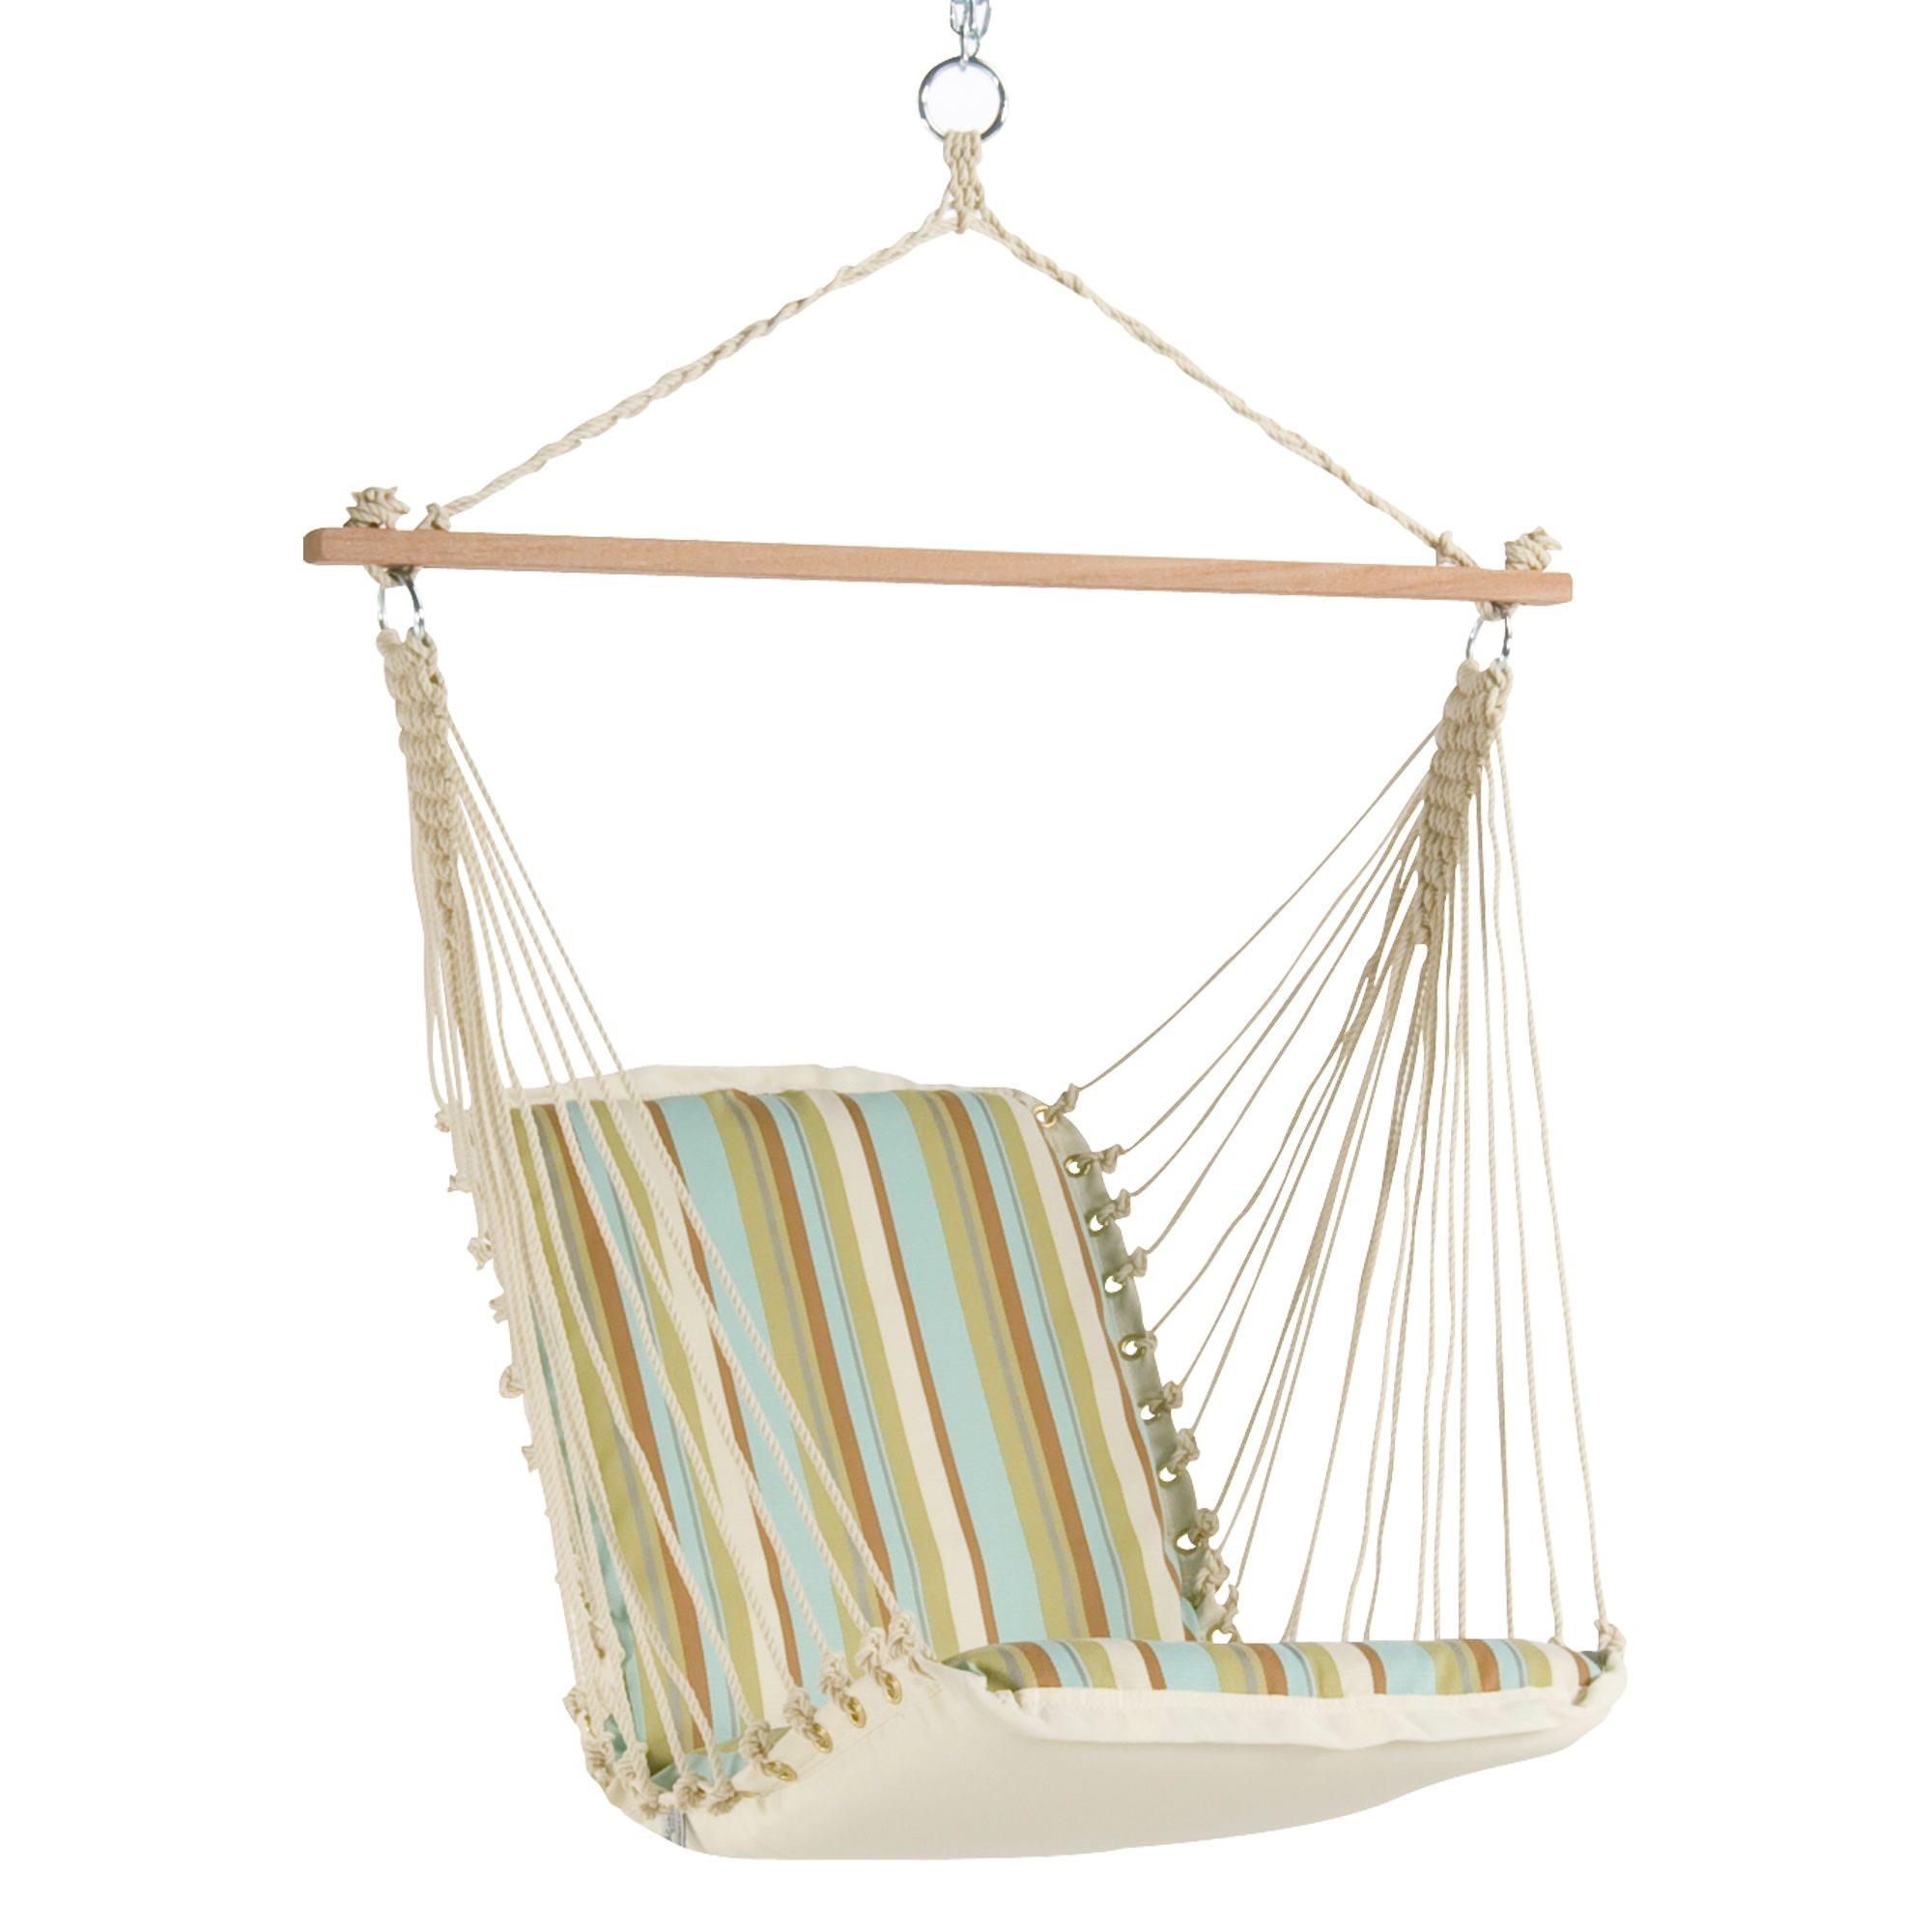 Single Cushioned Swing